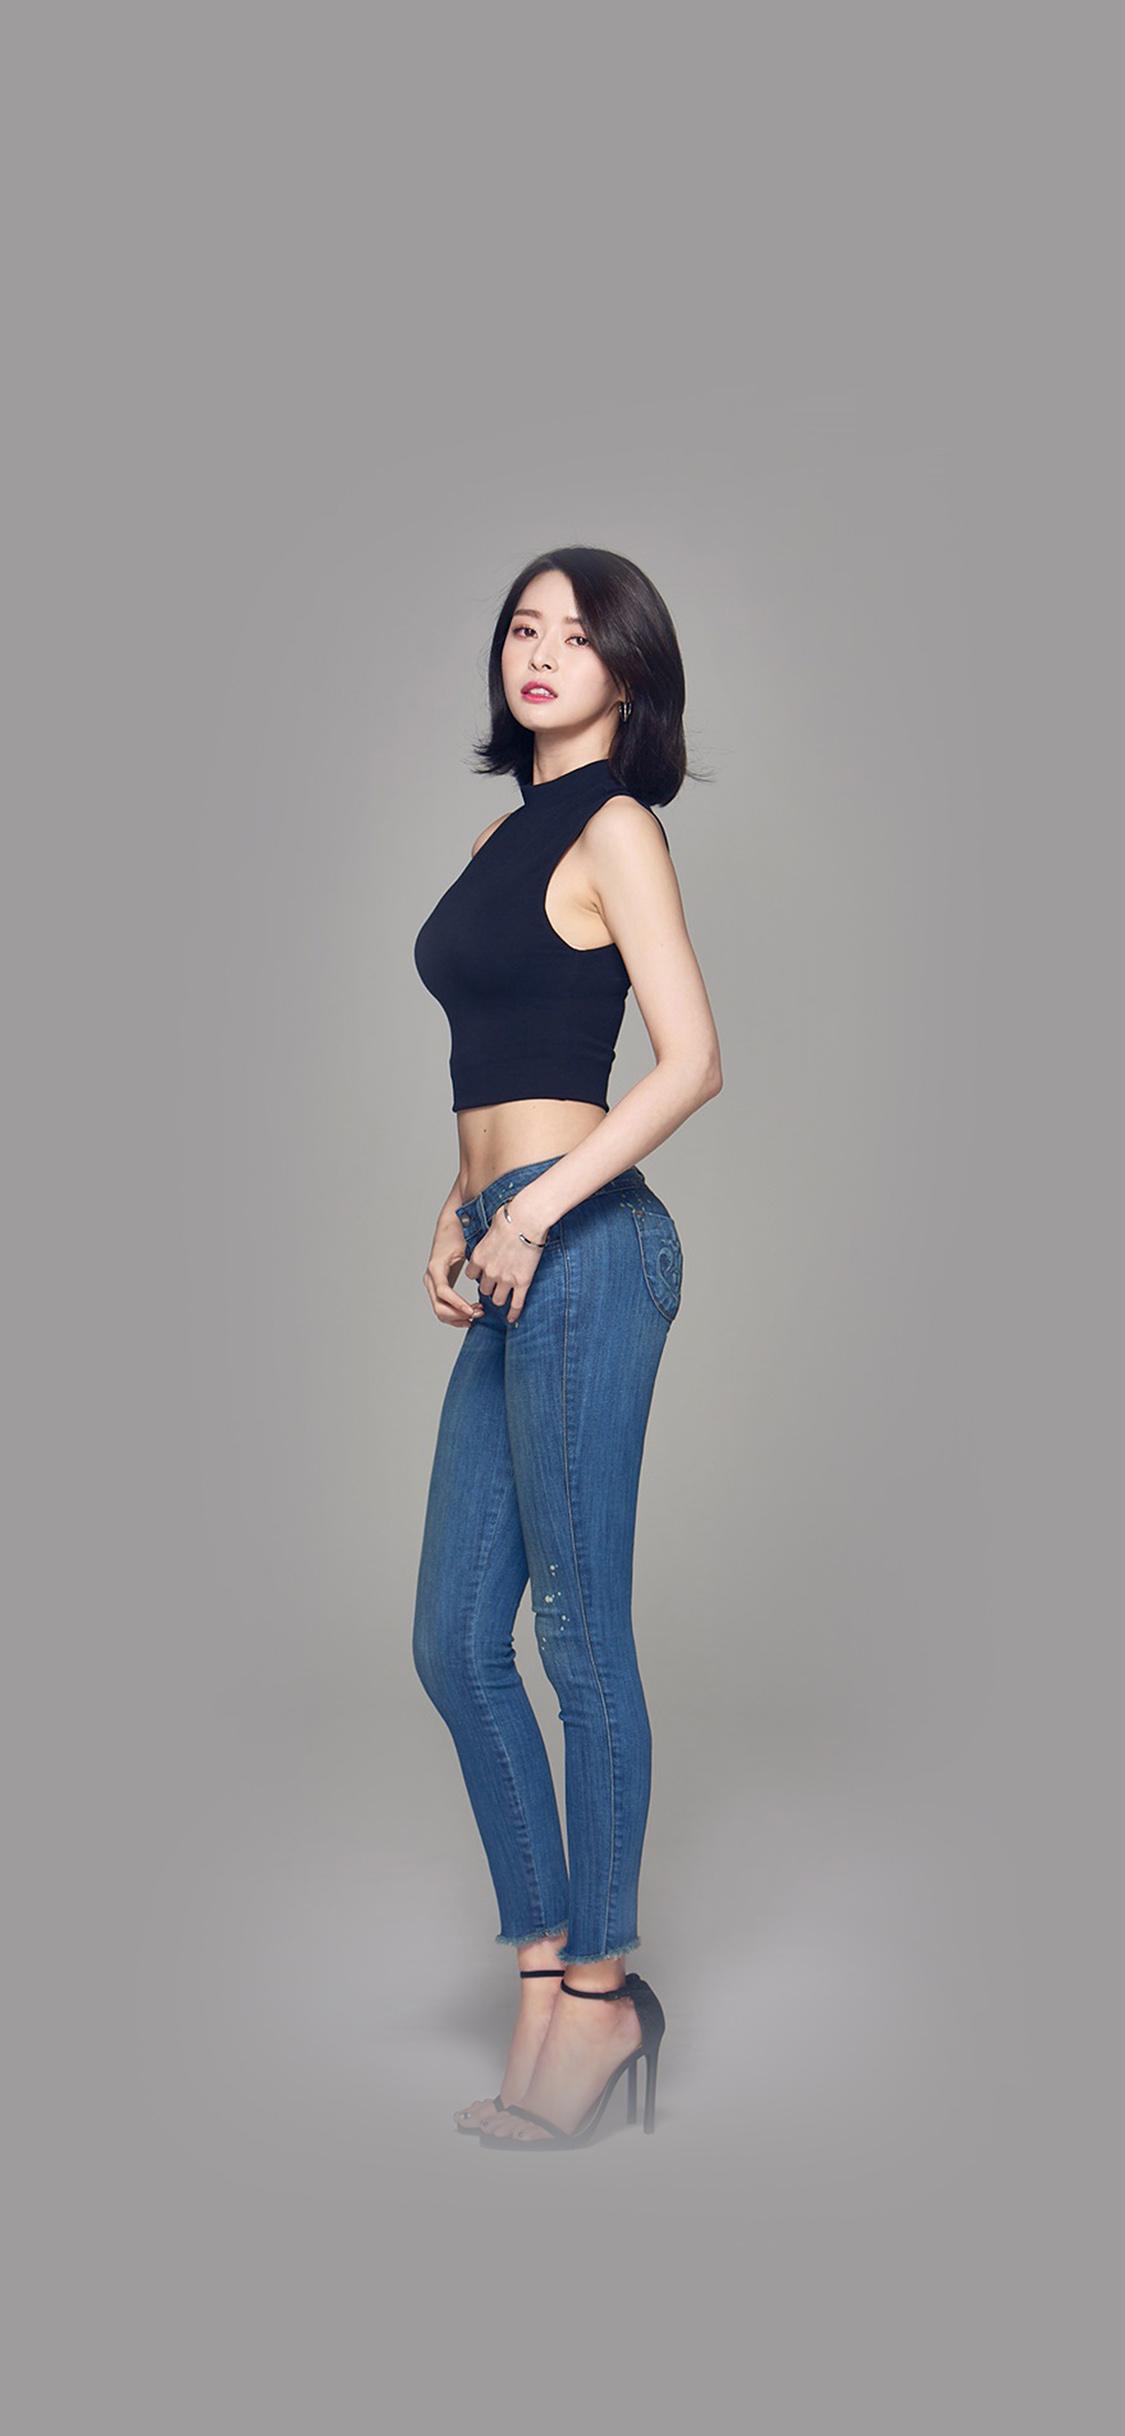 Iphonexpapers Com Iphone X Wallpaper Hj72 Kpop Girl Kwon